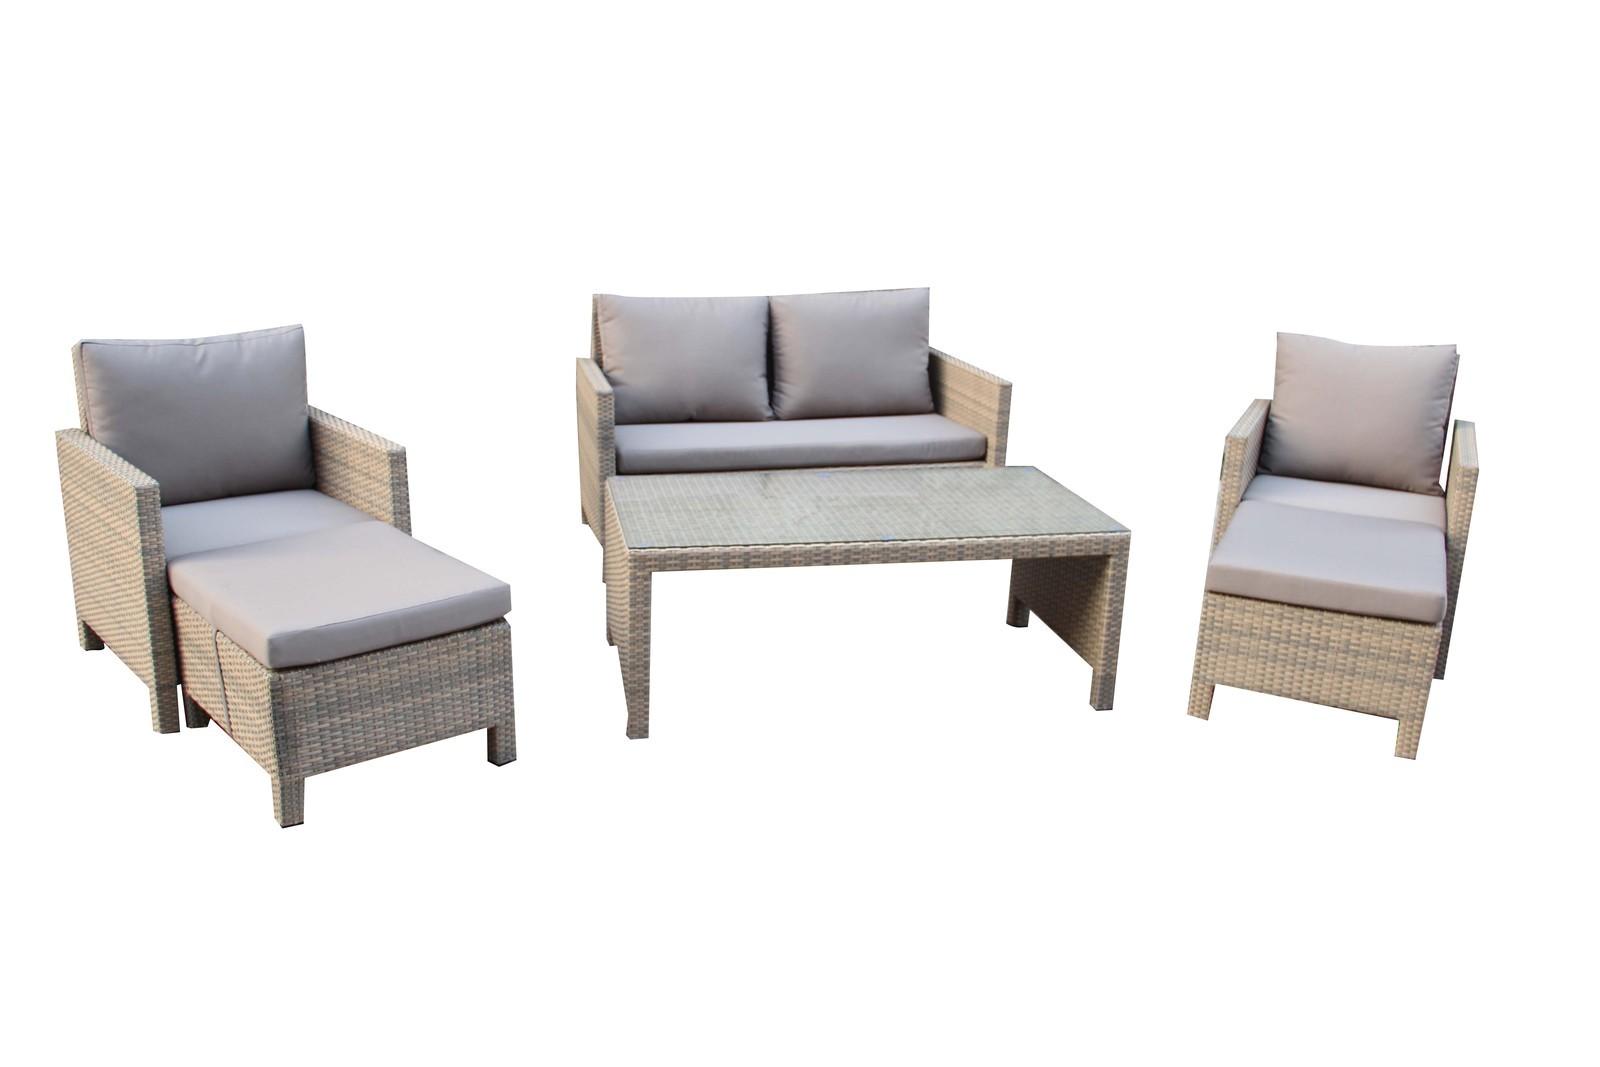 Qatar Vs Curacao sofa Zara Outdoor Furniture Brisbane Designer Style Lounge Ottoman Set